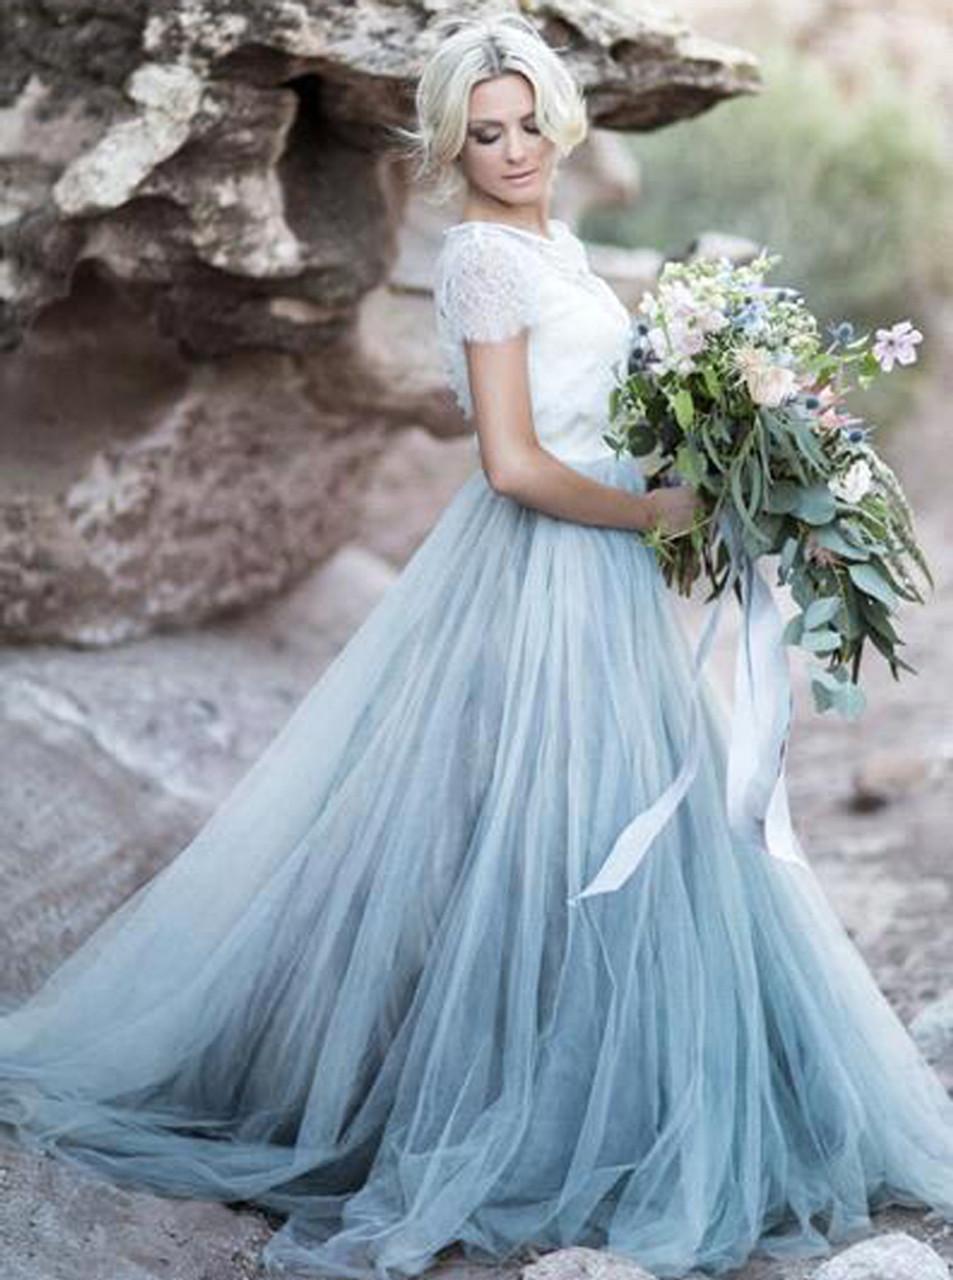 Dusty Blue Wedding Dresses,Rustic